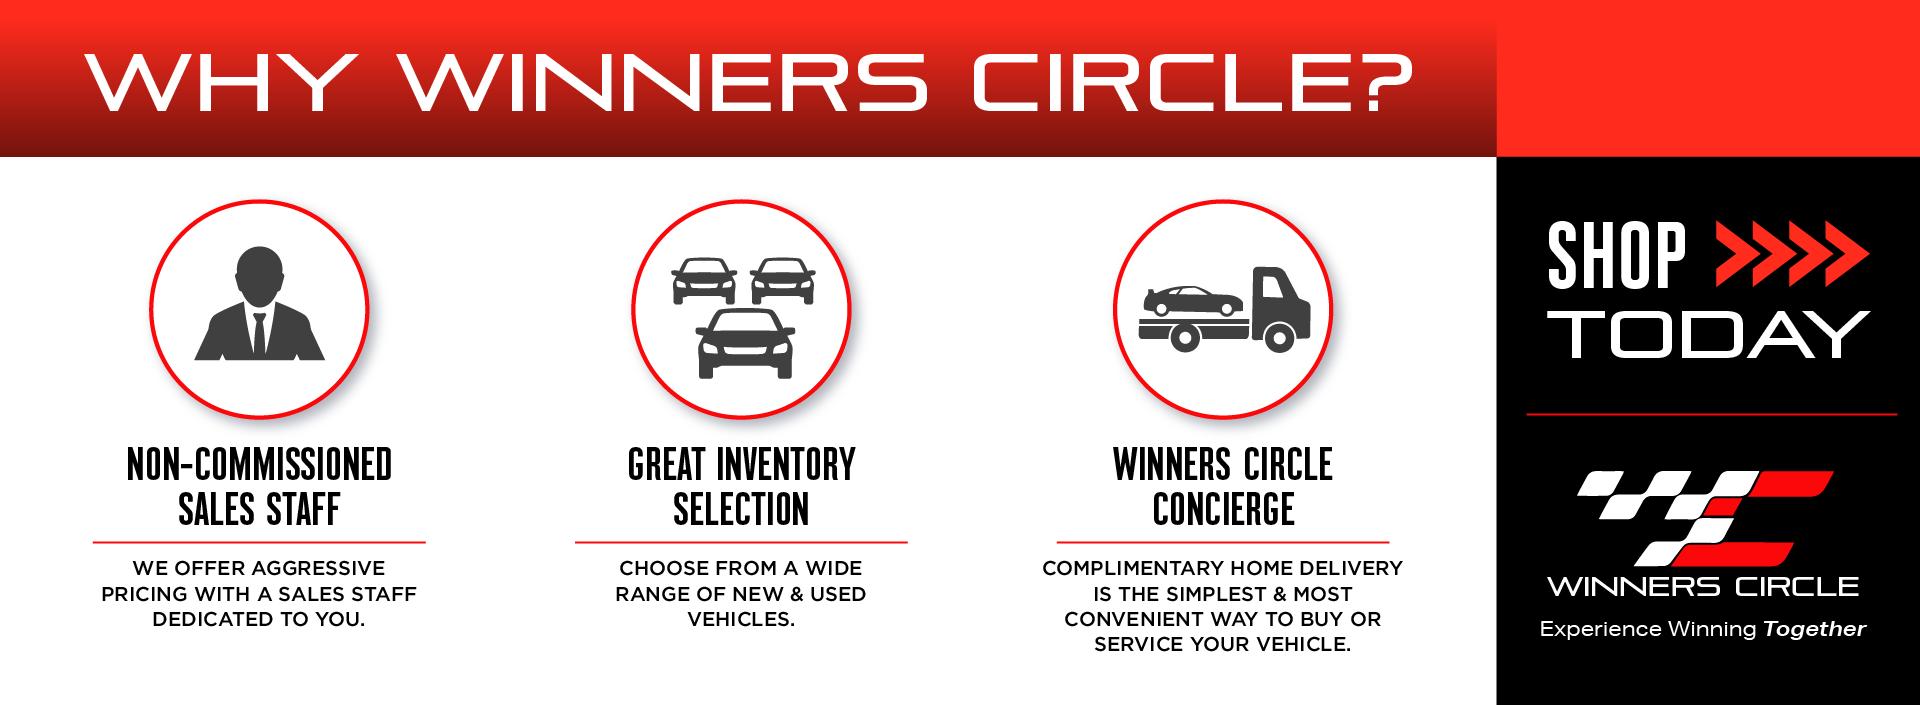 Why Winners Circle?